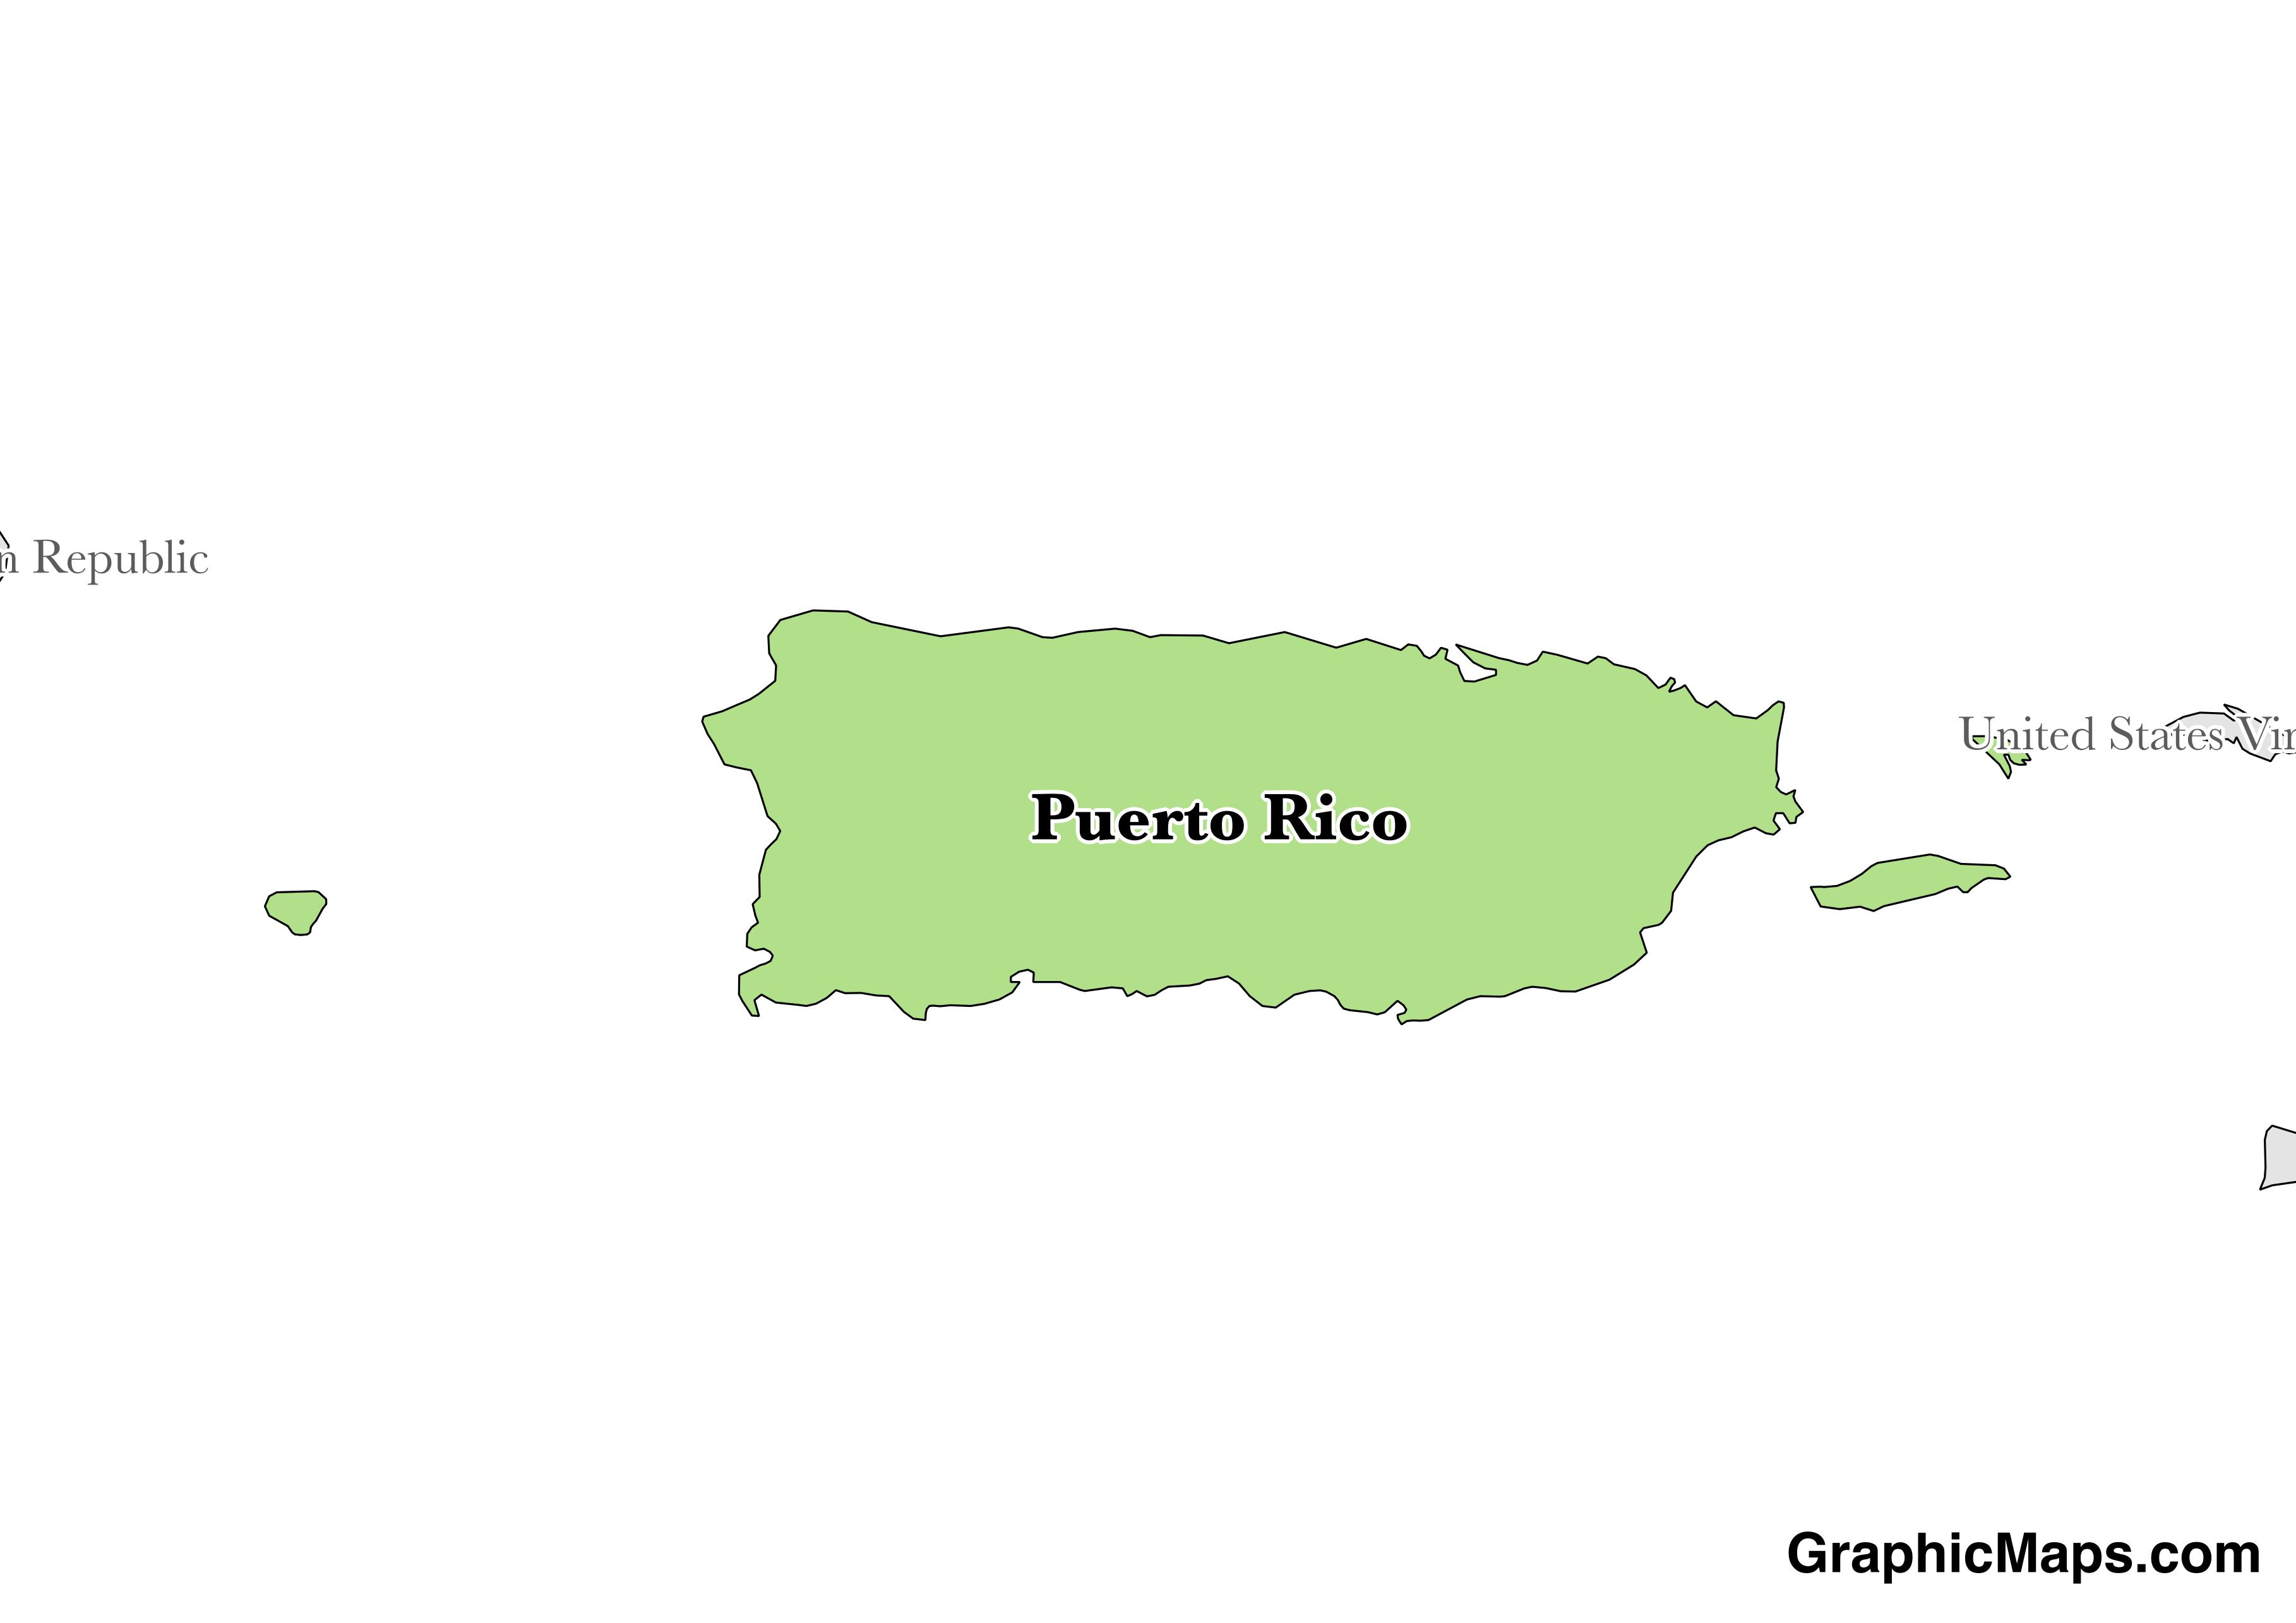 Puerto Rico Graphicmaps